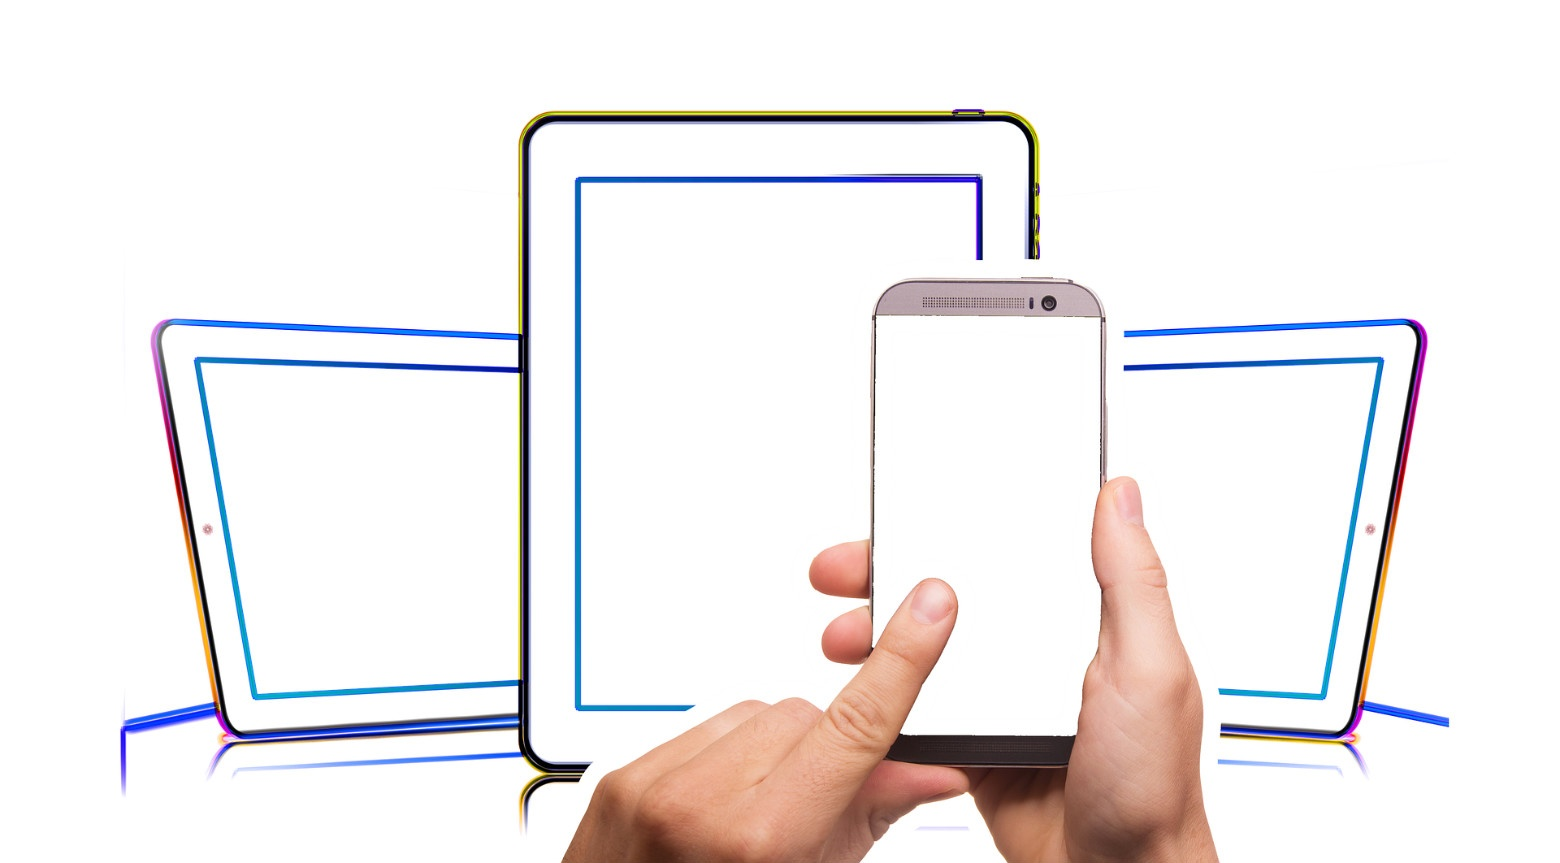 E-Commerce News Roundup: Mobile App Sales Overtake Mobile Web